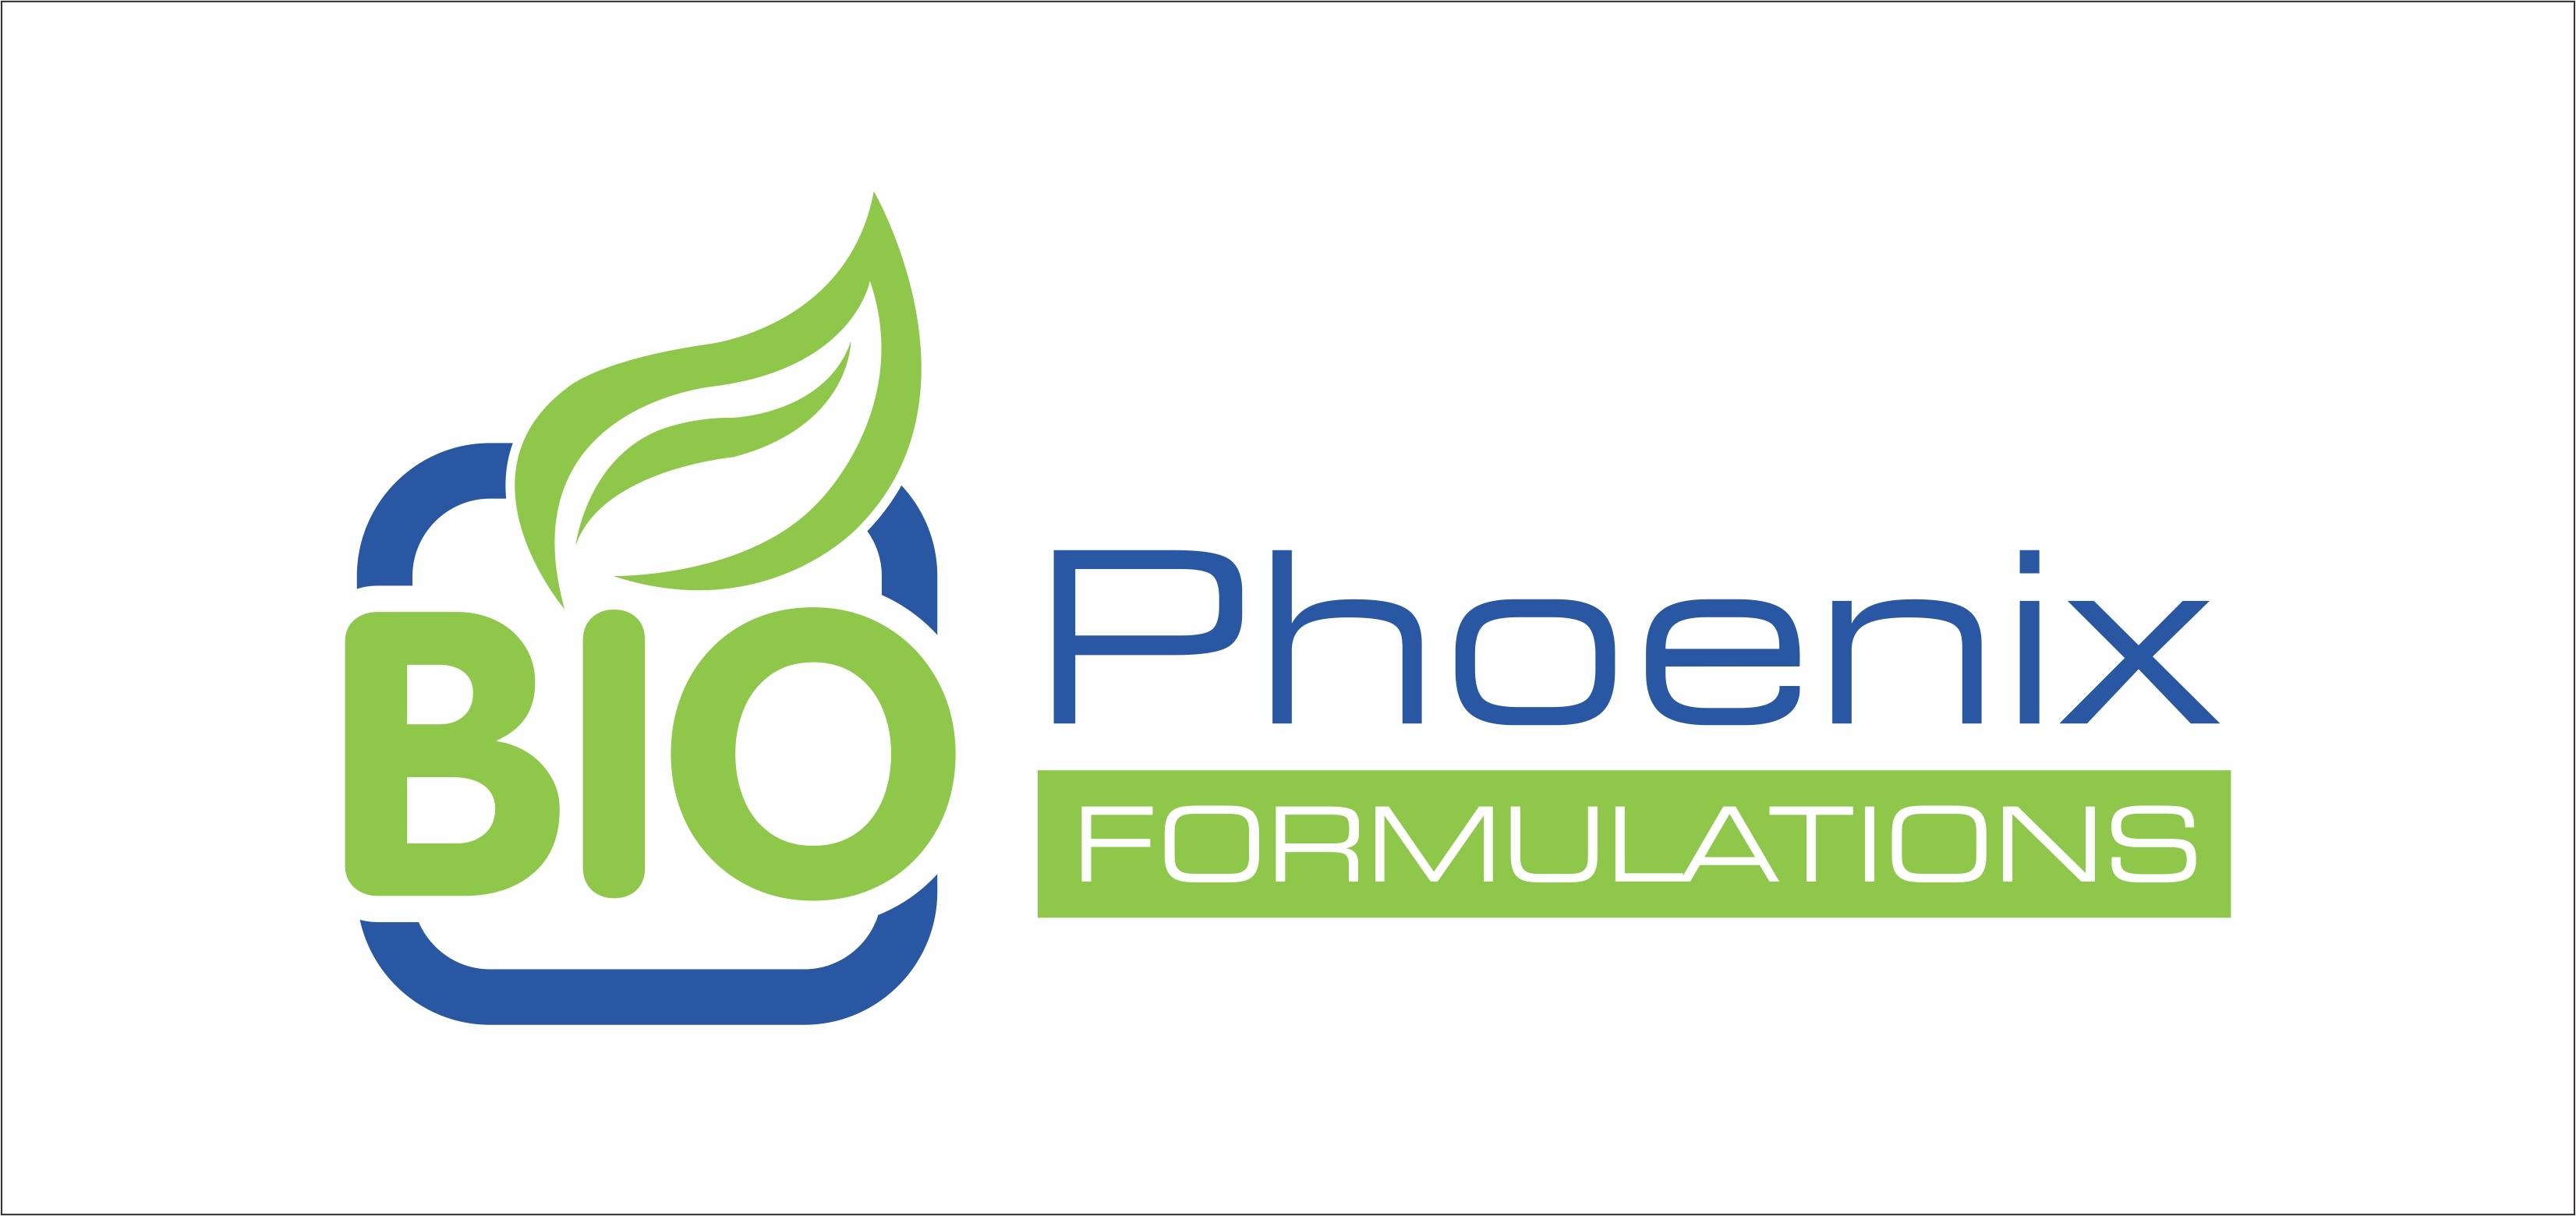 BIO PHOENIX contact us: 9952055736 - logo